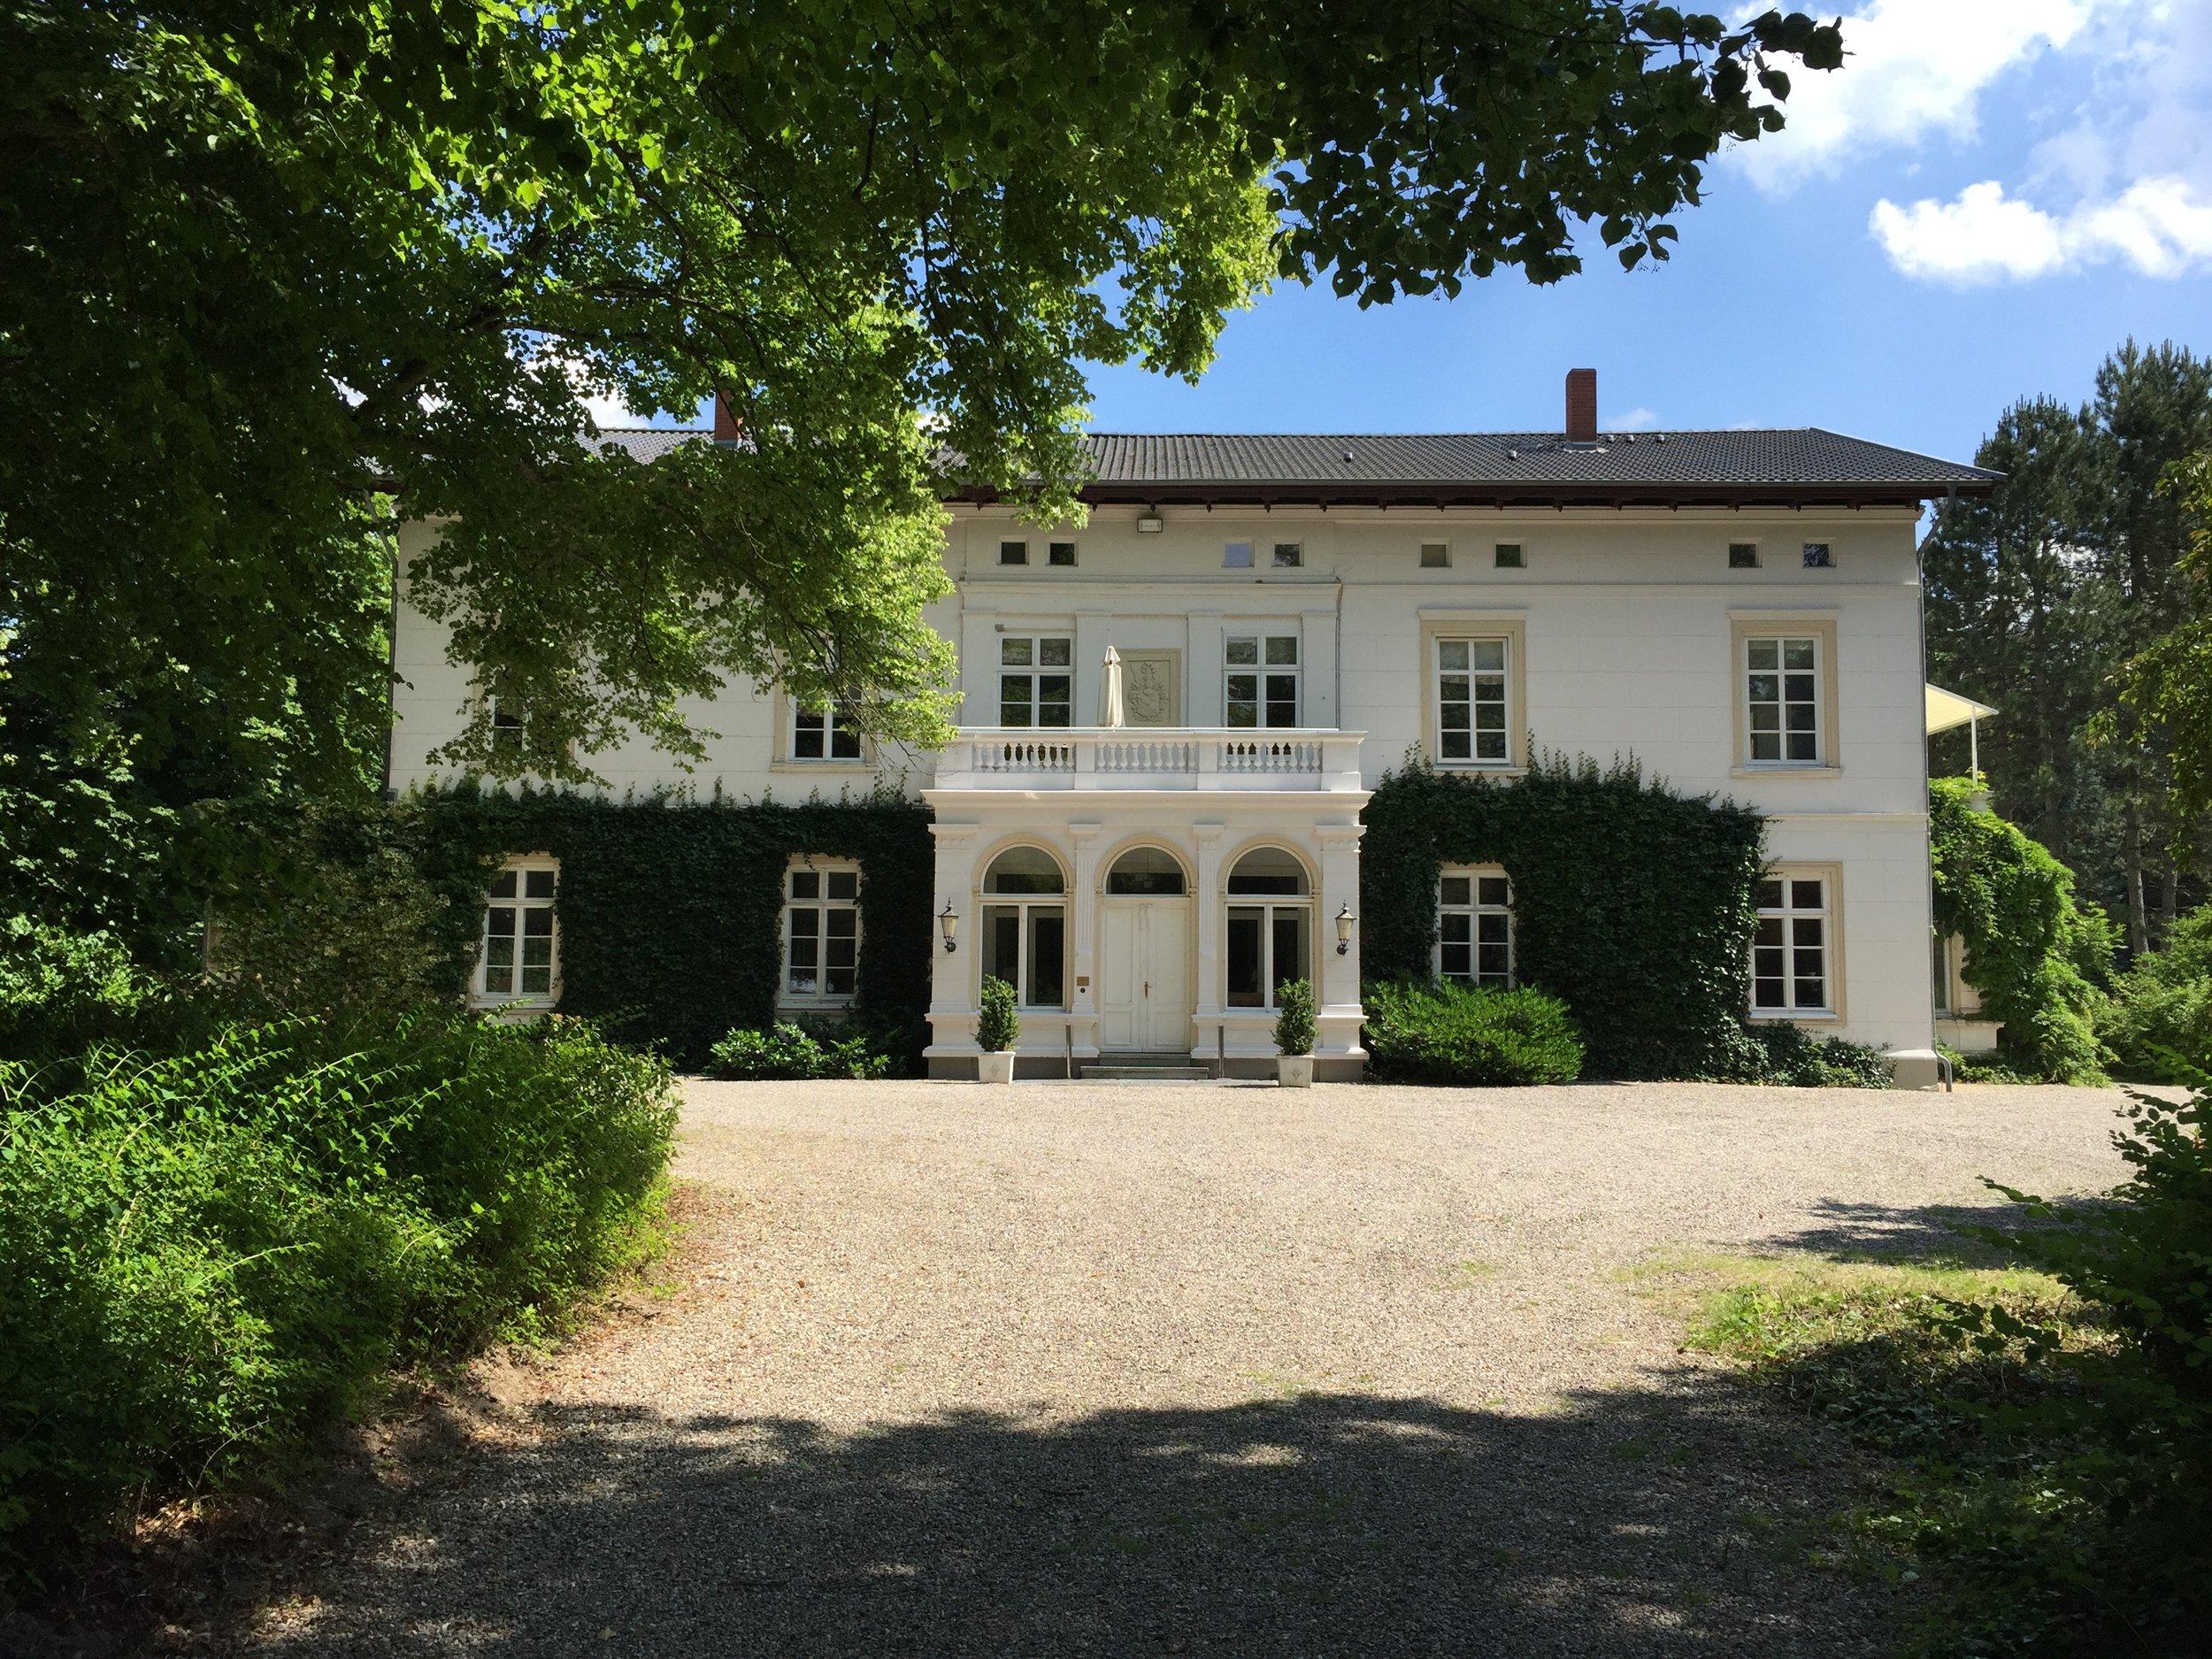 Escapada-retreat-gut-bliestorf-lauenburg-germany.jpg